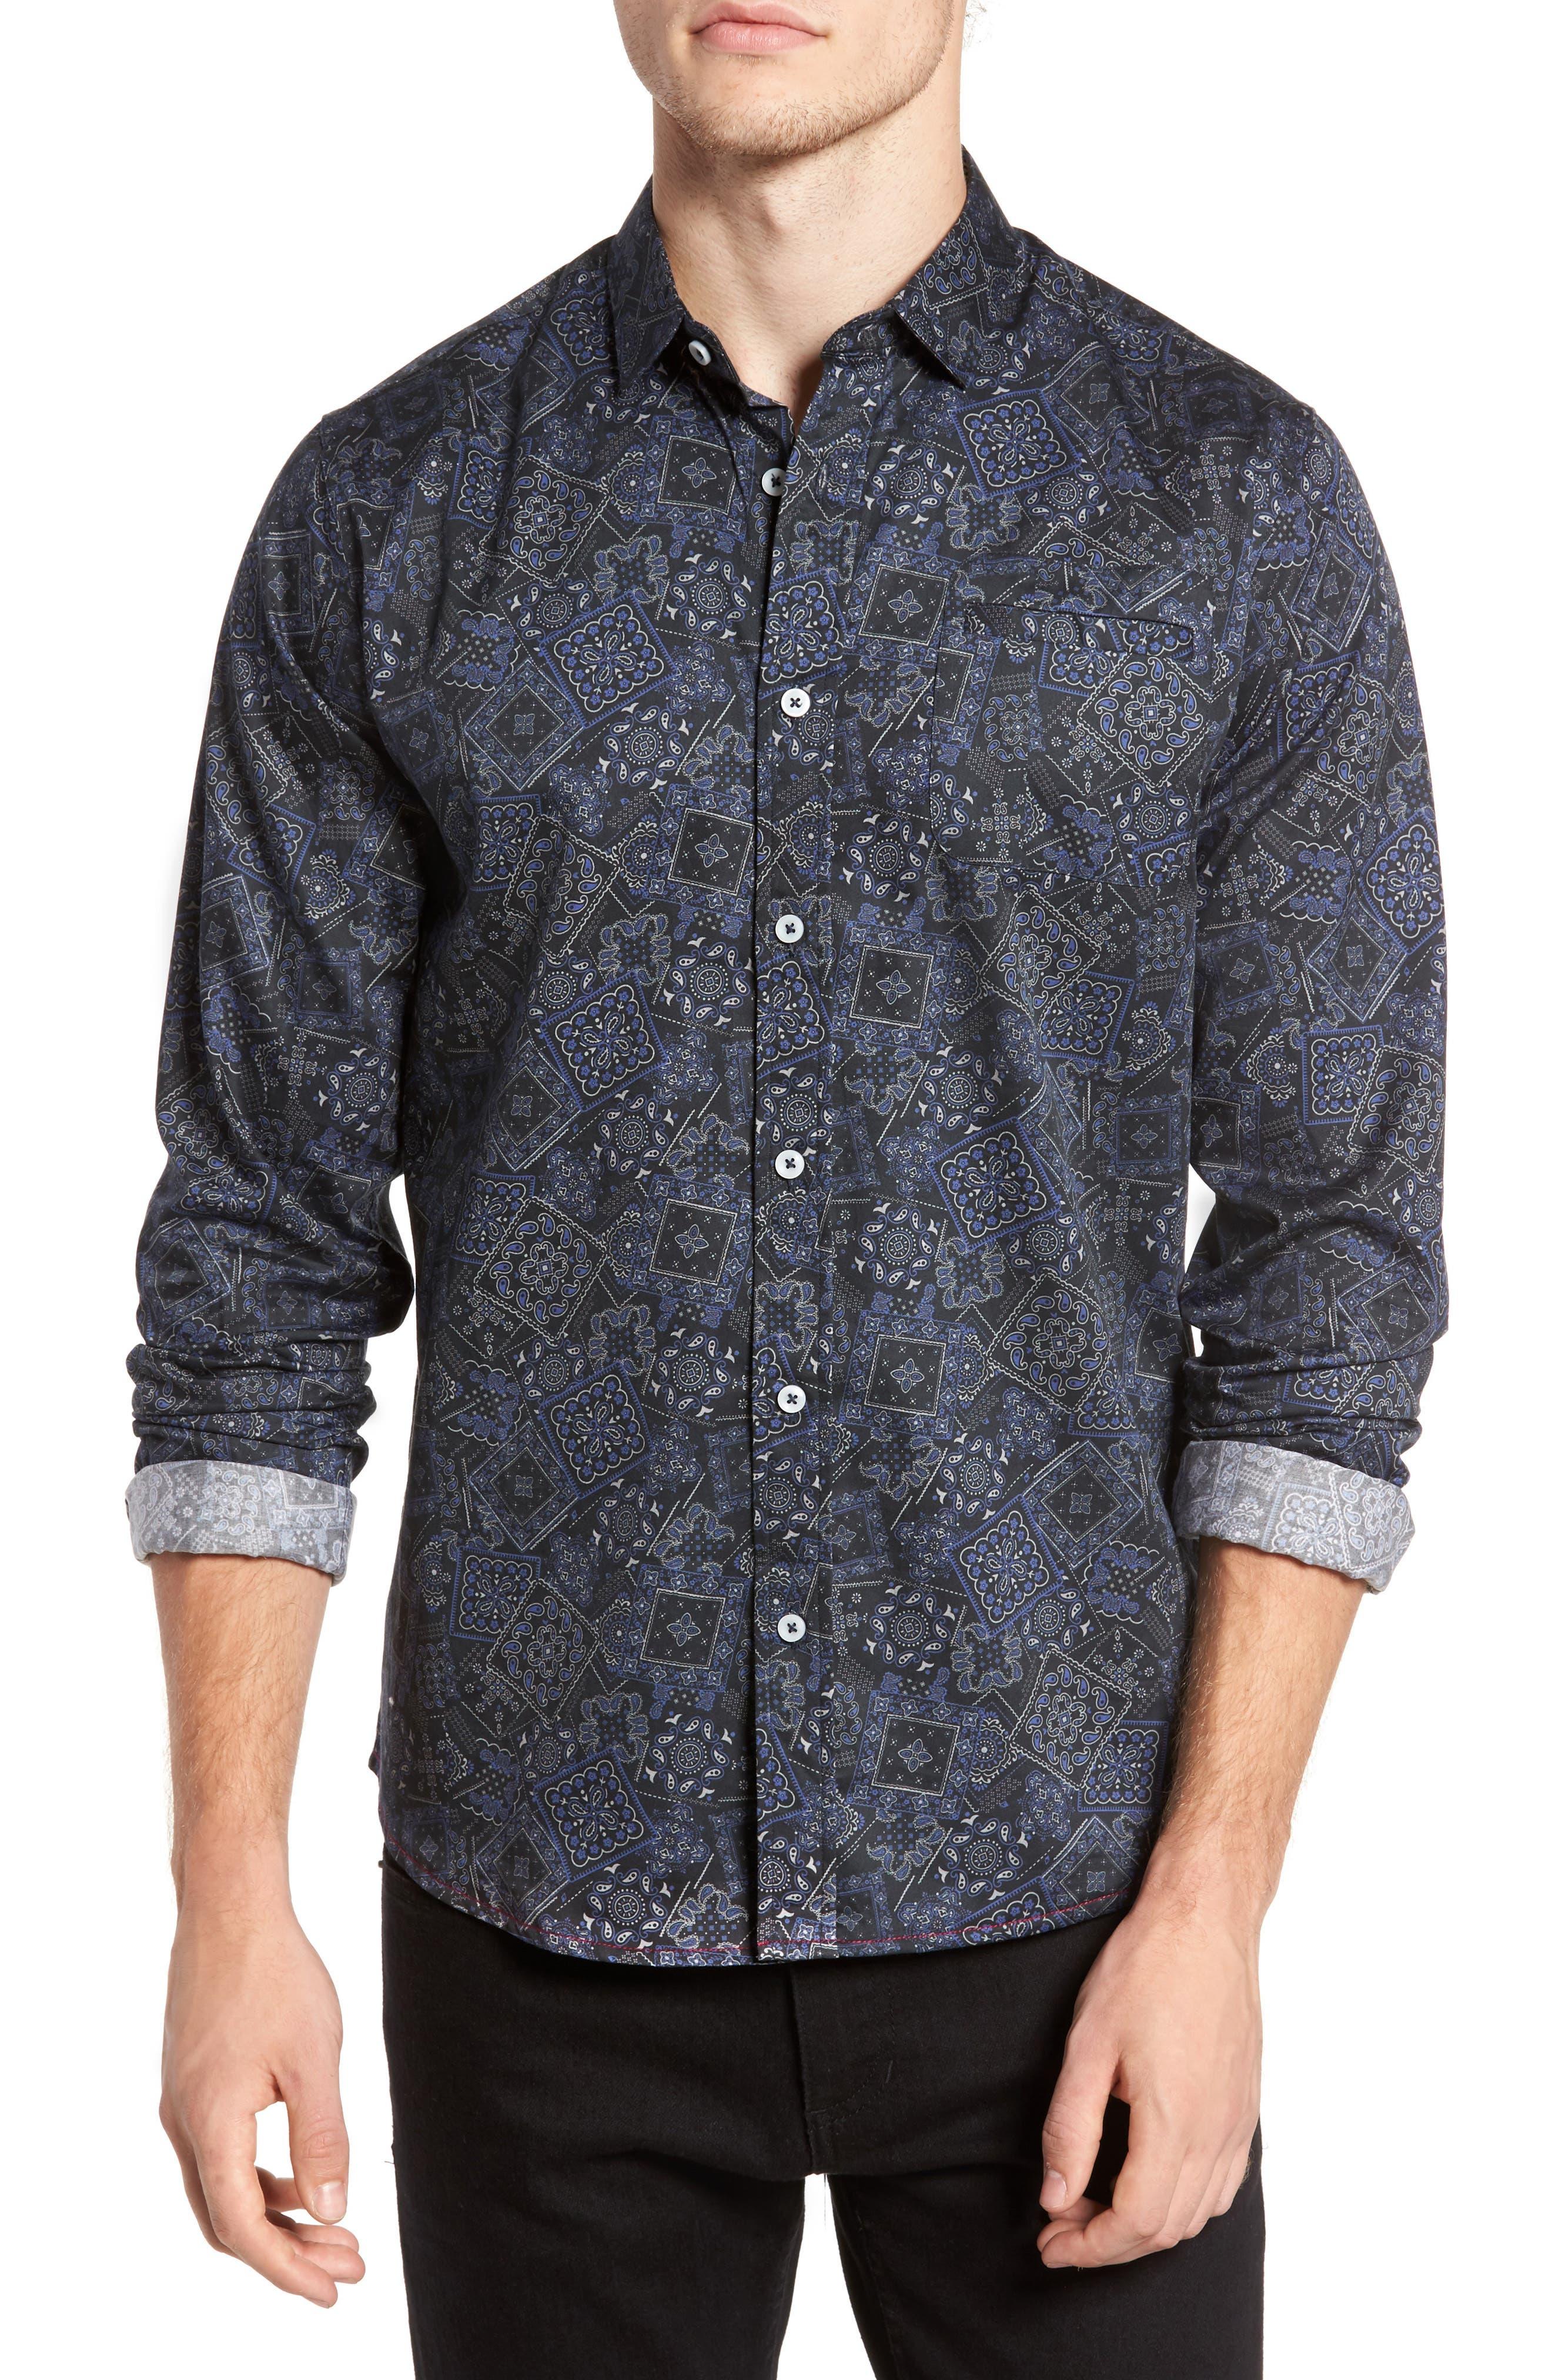 Alternate Image 1 Selected - Descendant of Thieves Bandana Woven Shirt